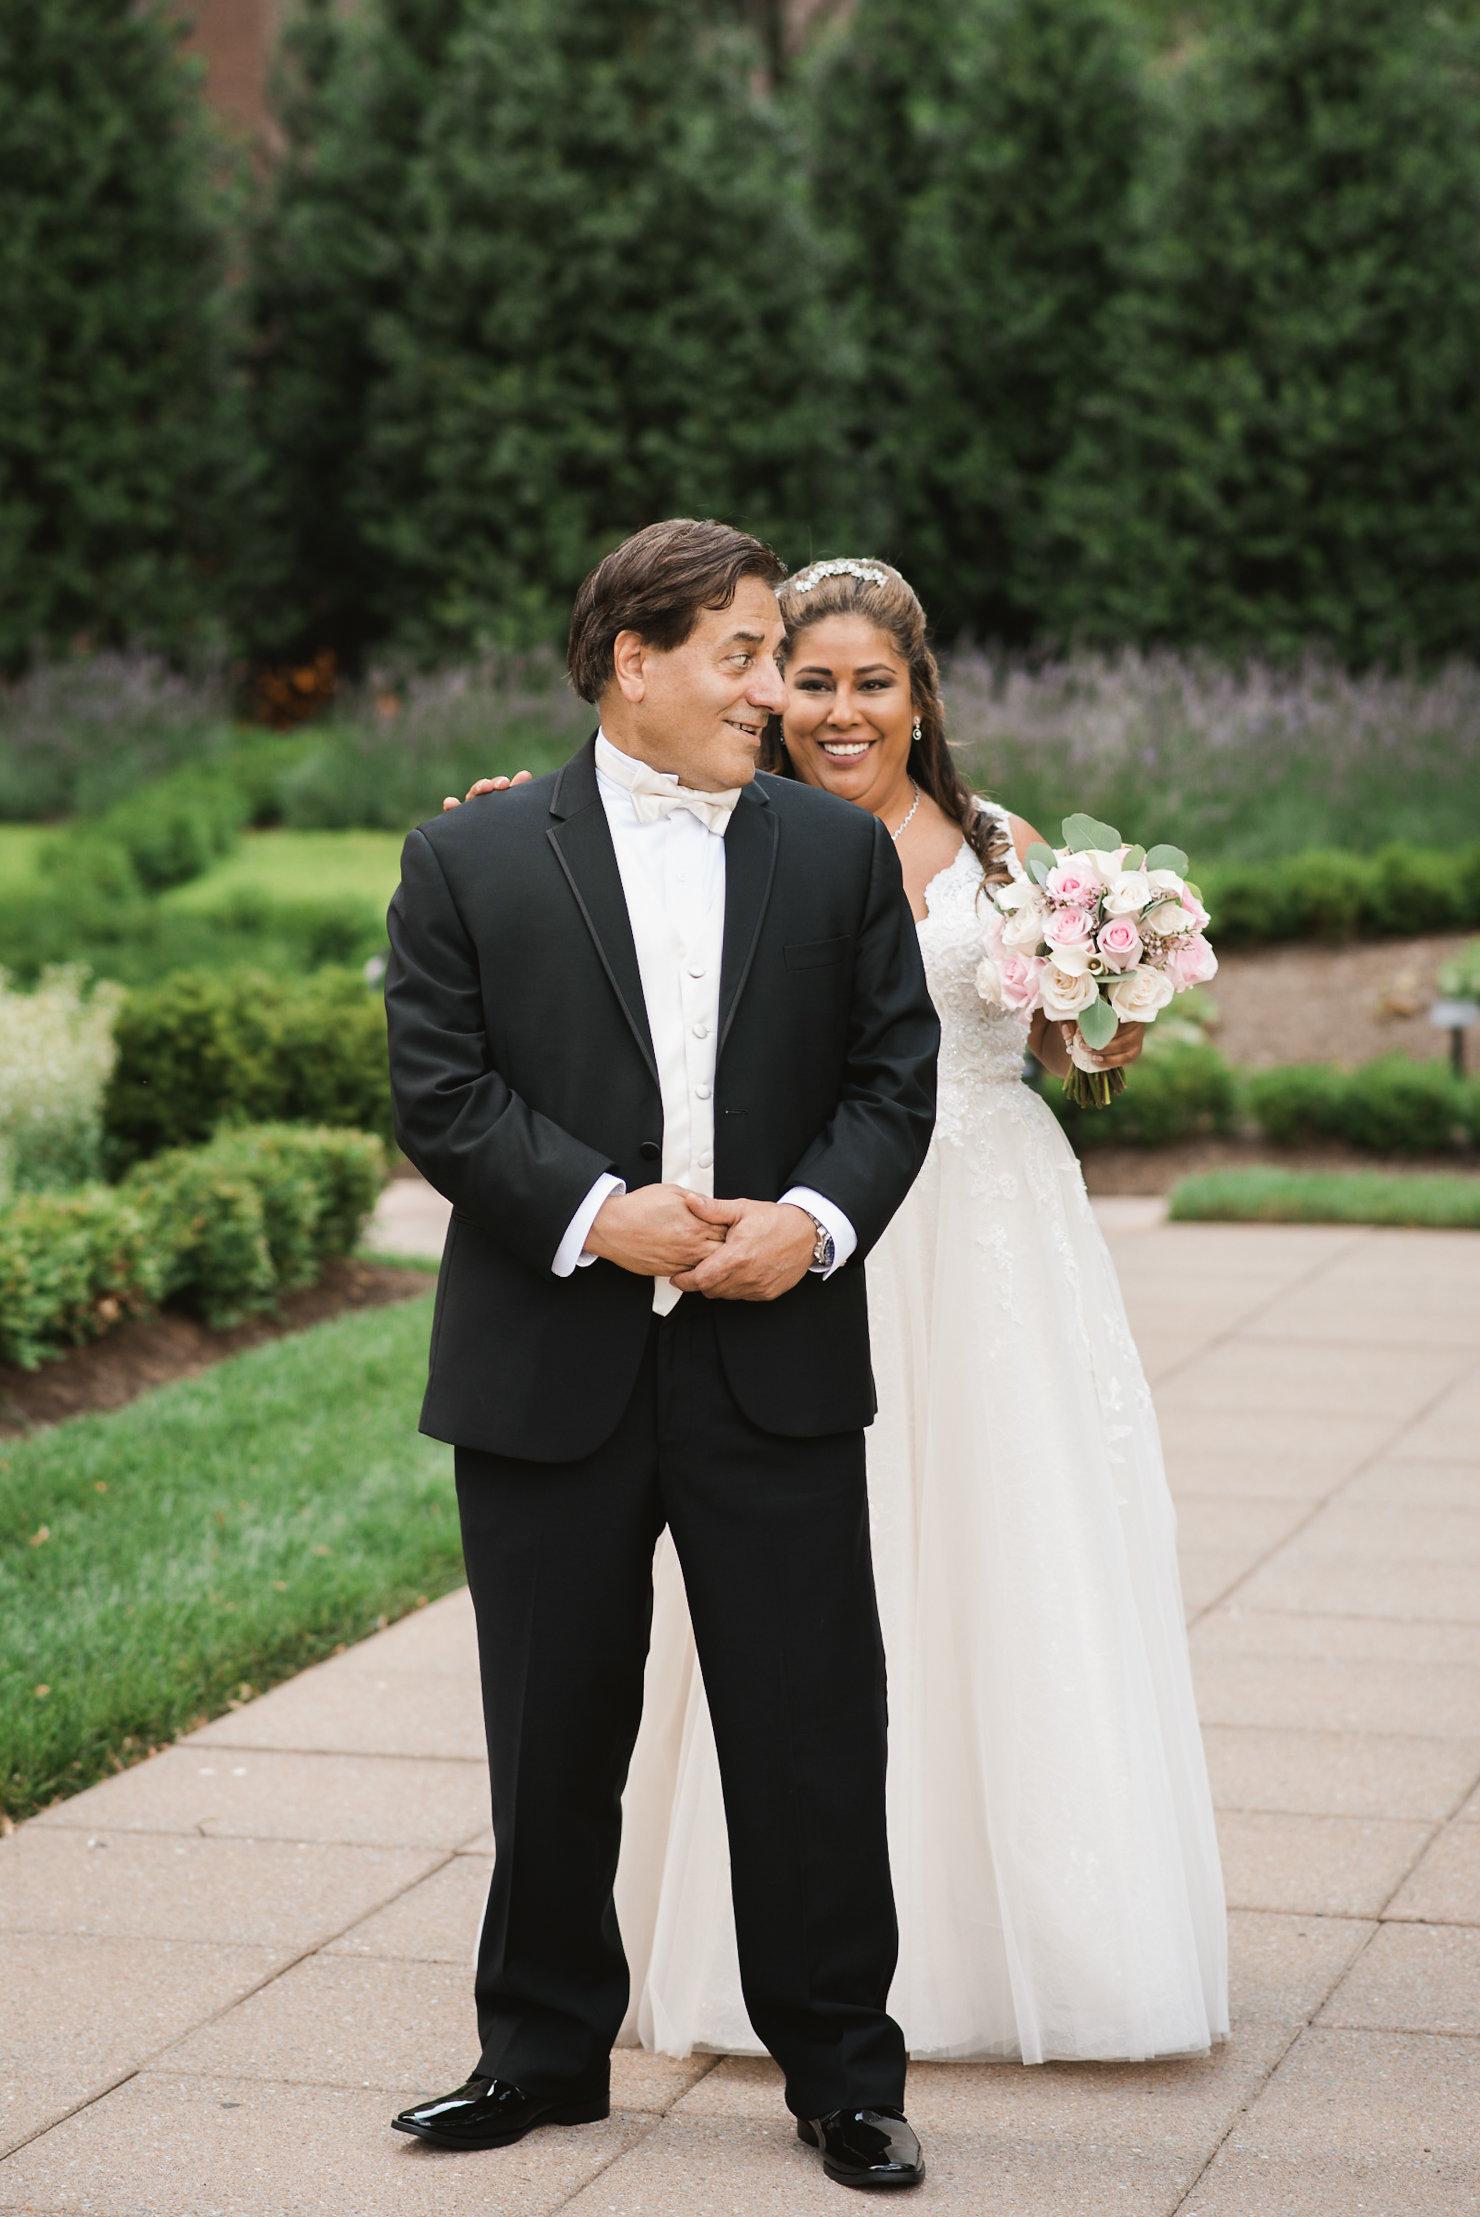 Groom looking over shoulder at bride